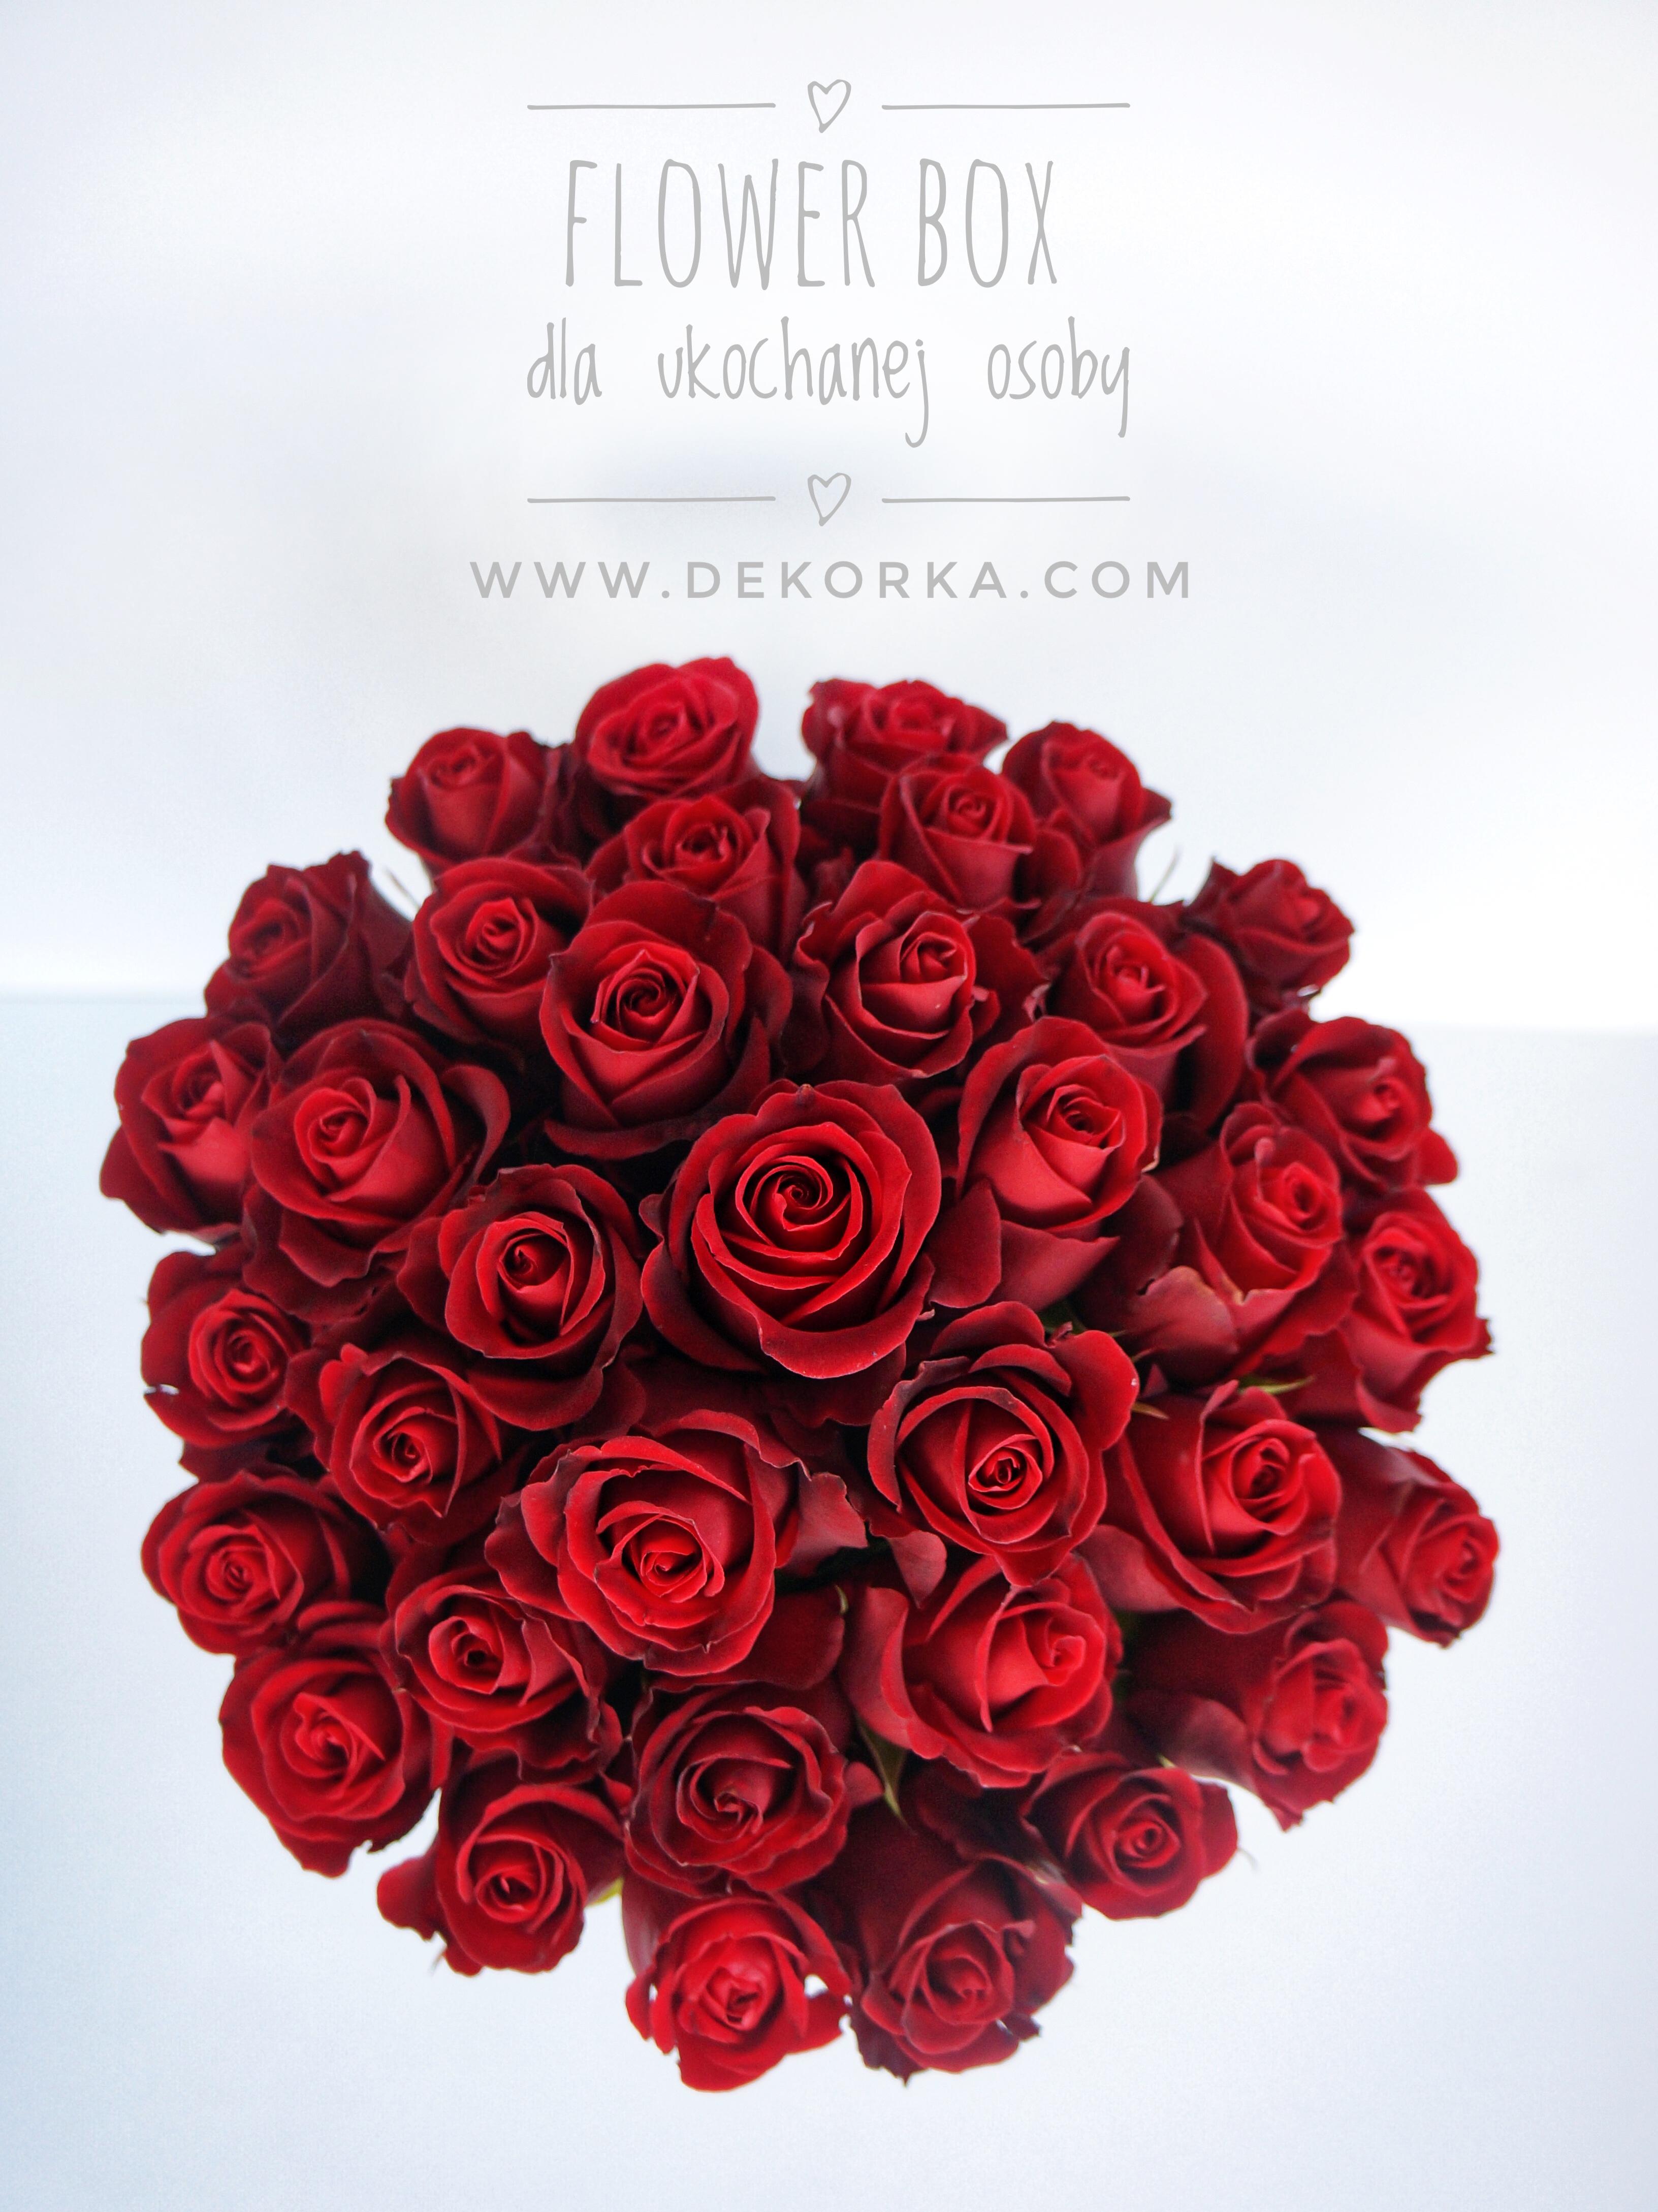 flower box katowice dekorka.com